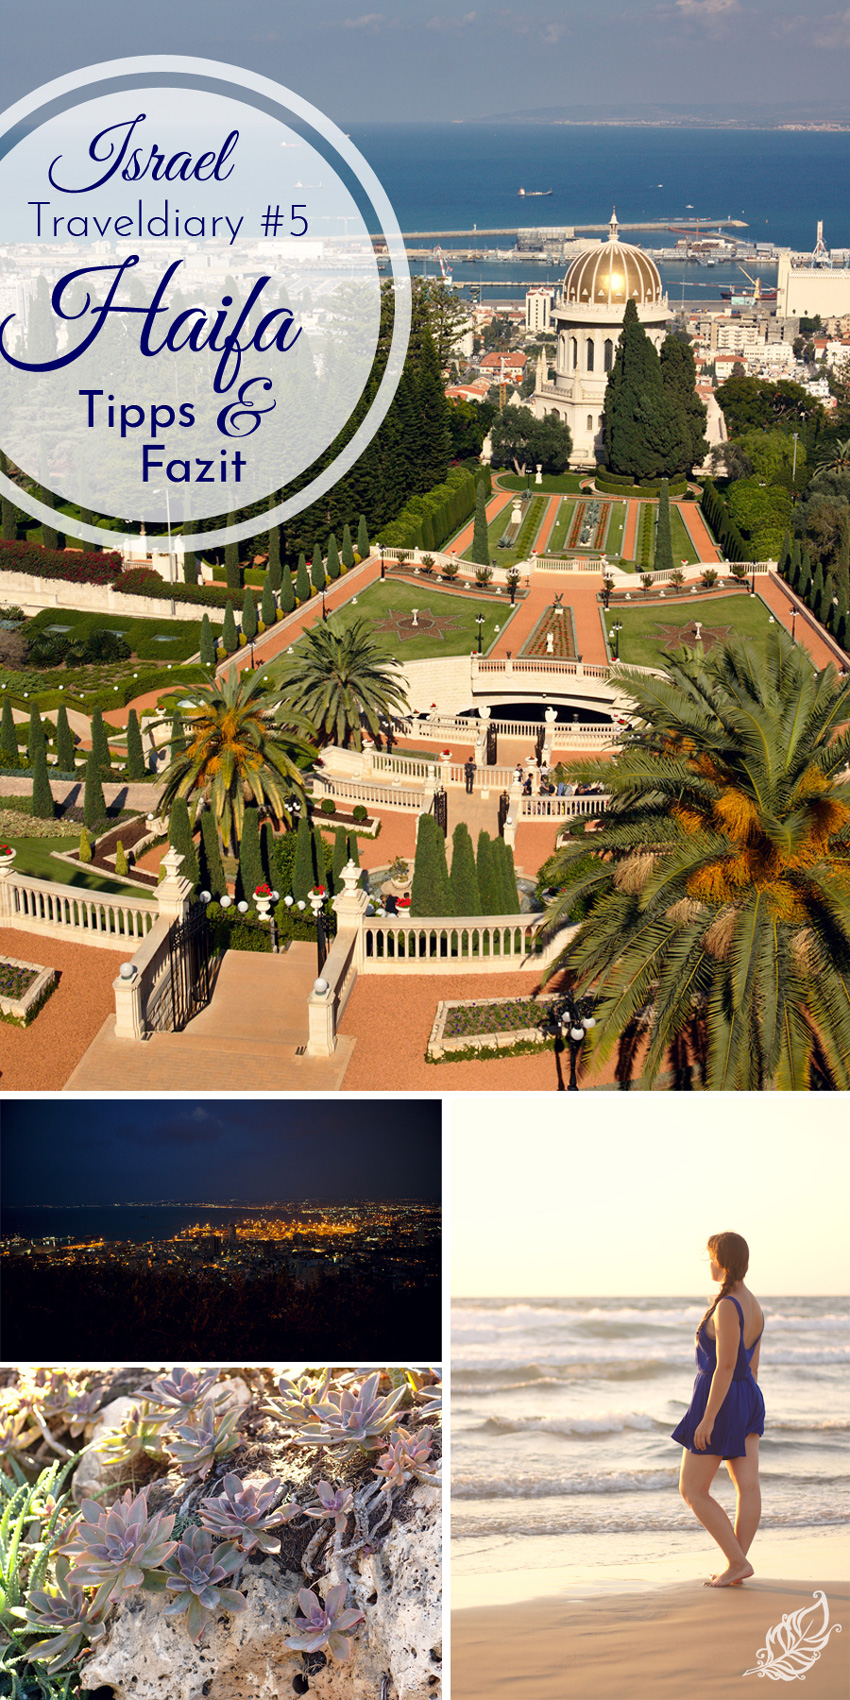 All the wonderful things: Israel Traveldiary #5 - Haifa: Tipps & Fazit; Bahai Gardens, Dado Beach